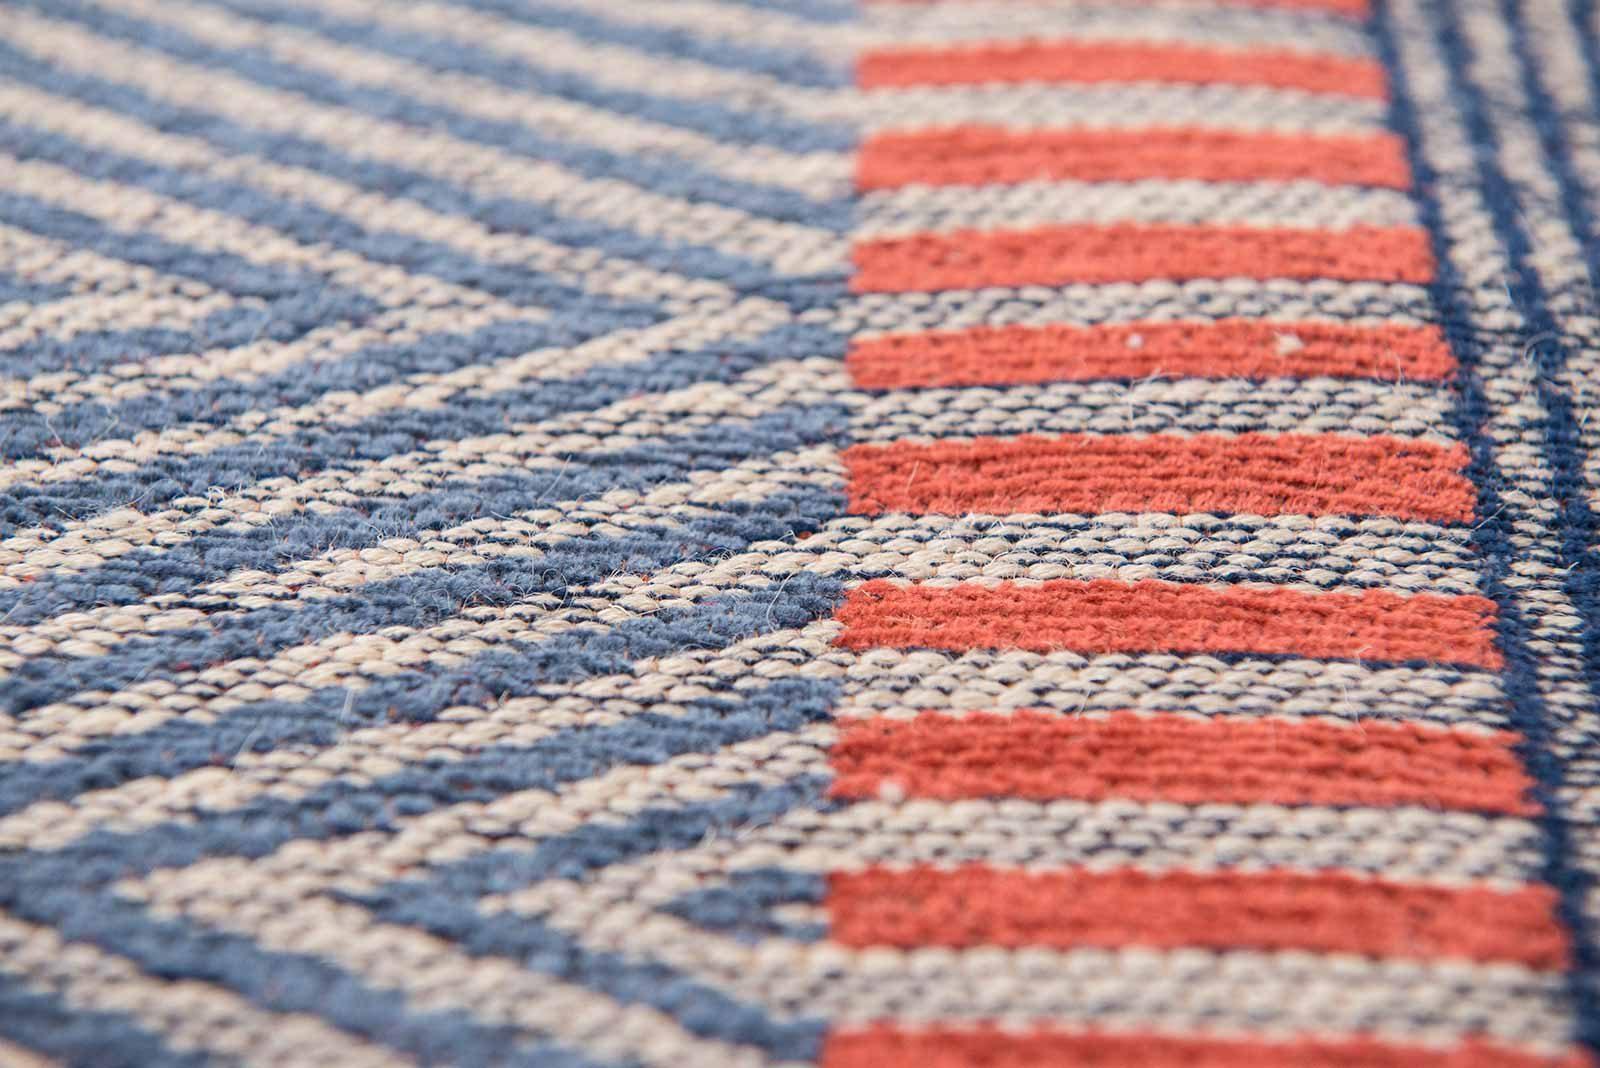 Louis De Poortere alfombras Villa Nova LX 8767 Tobi Indigo Tabasco zoom 4